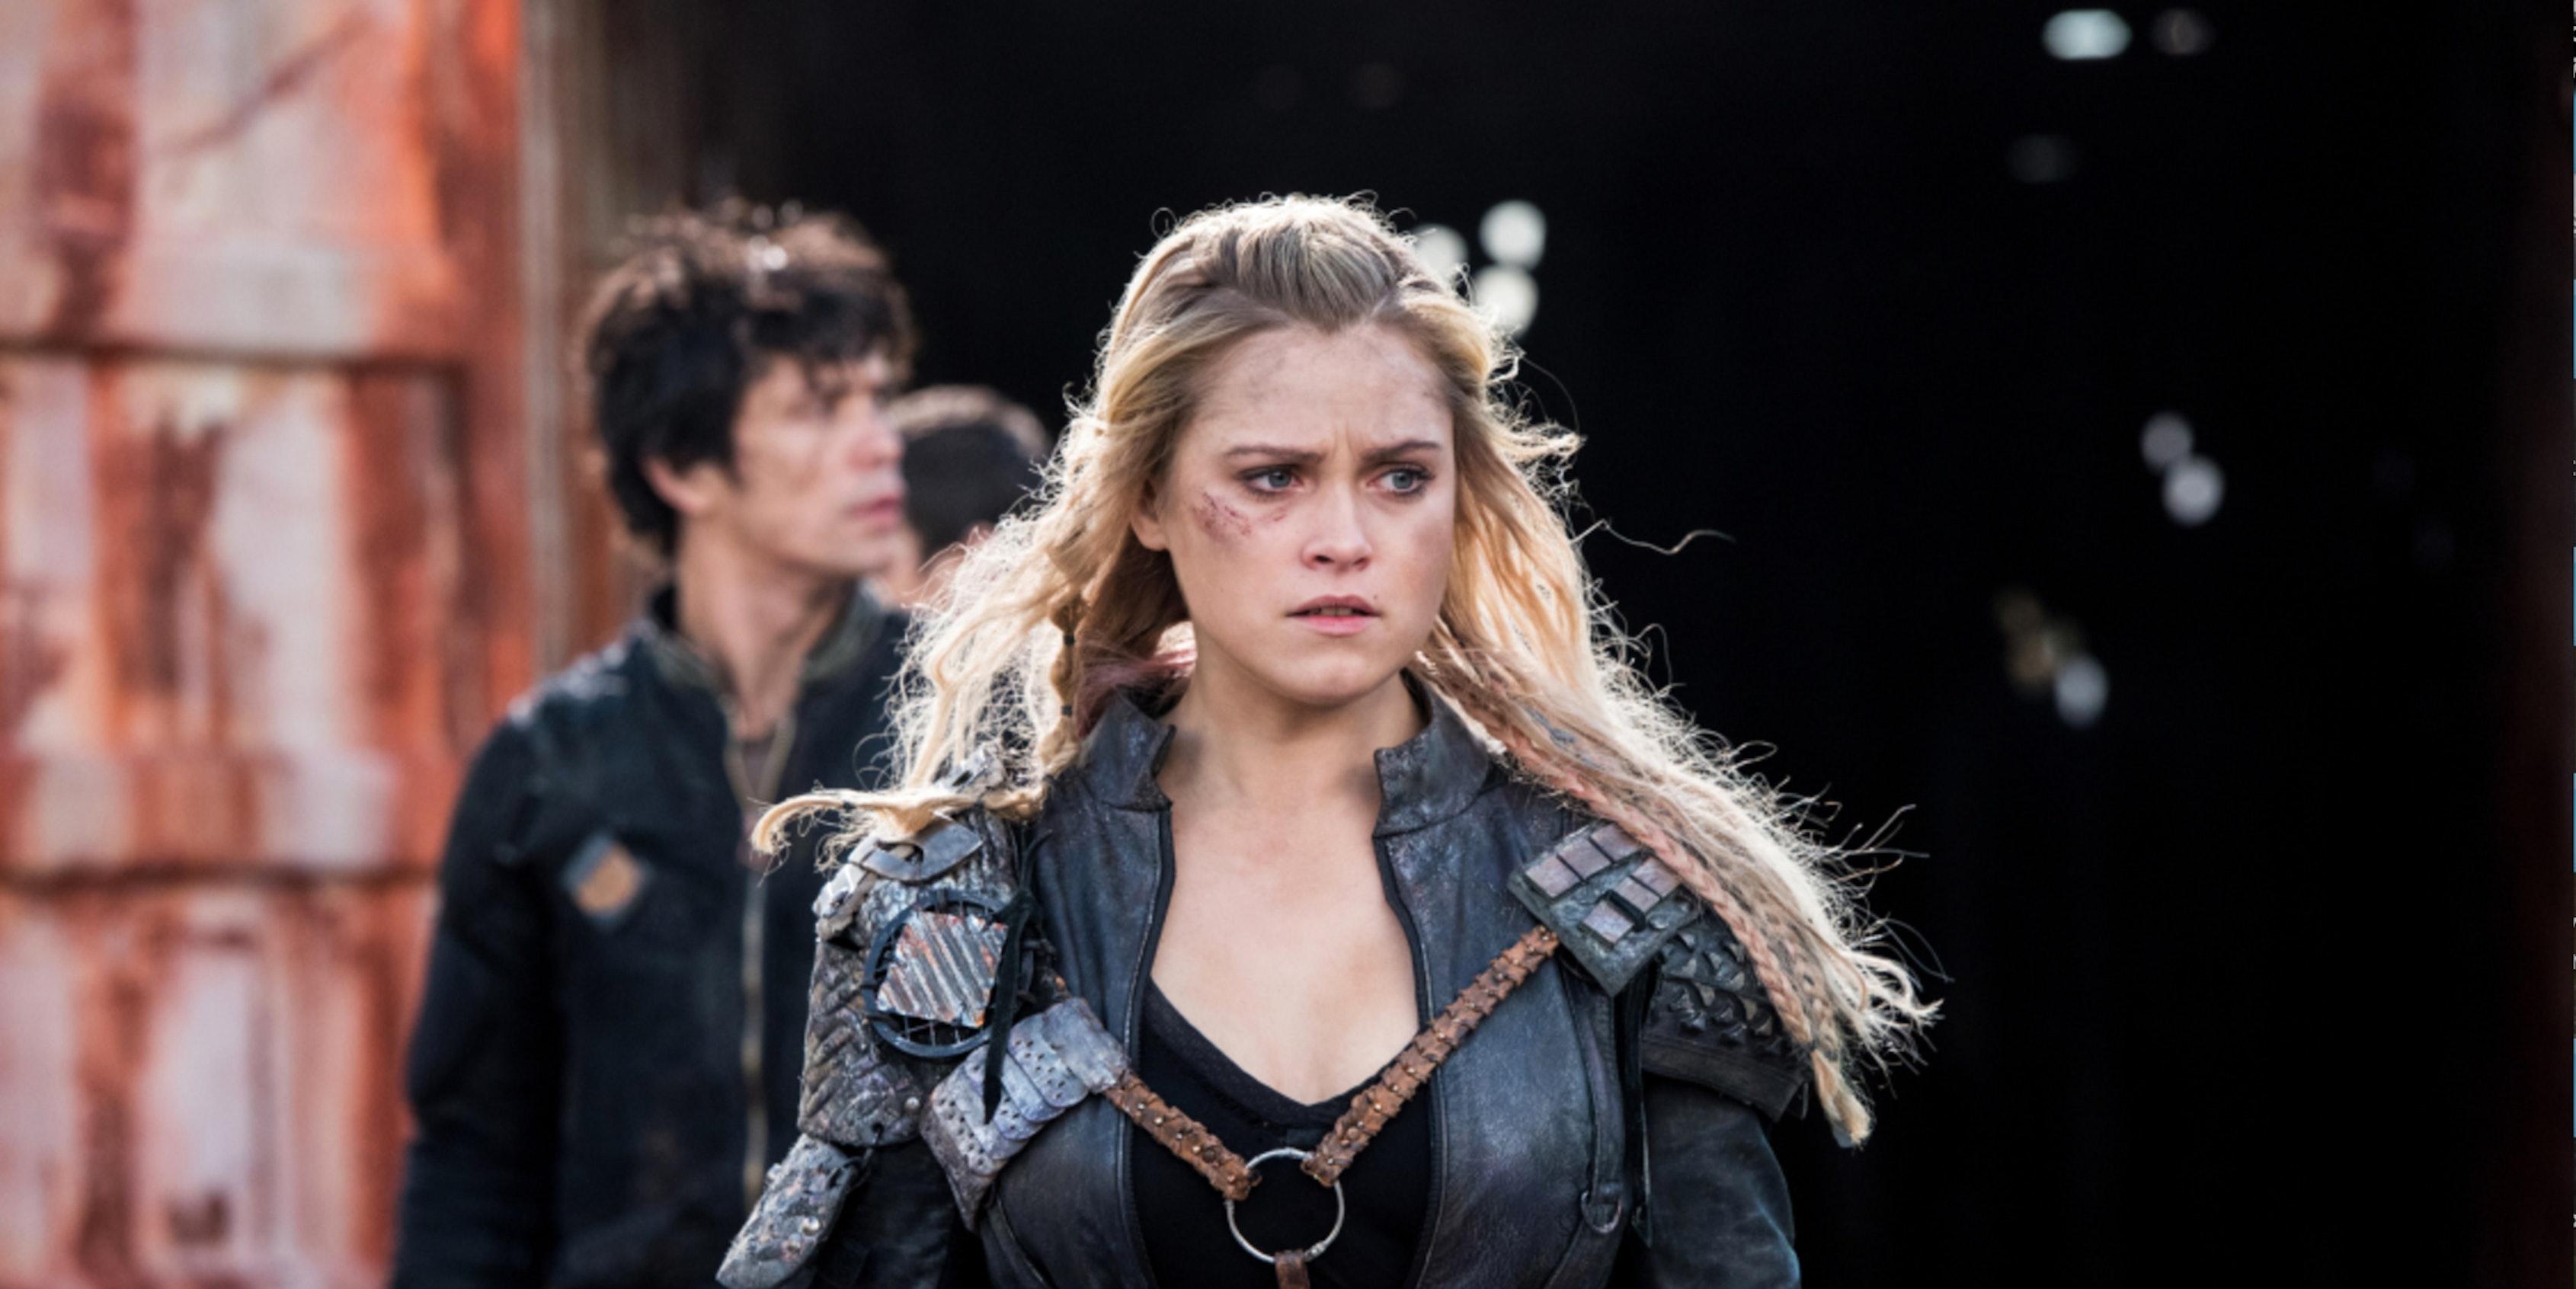 Clarke and Bellamy in 'The 100' Season 4